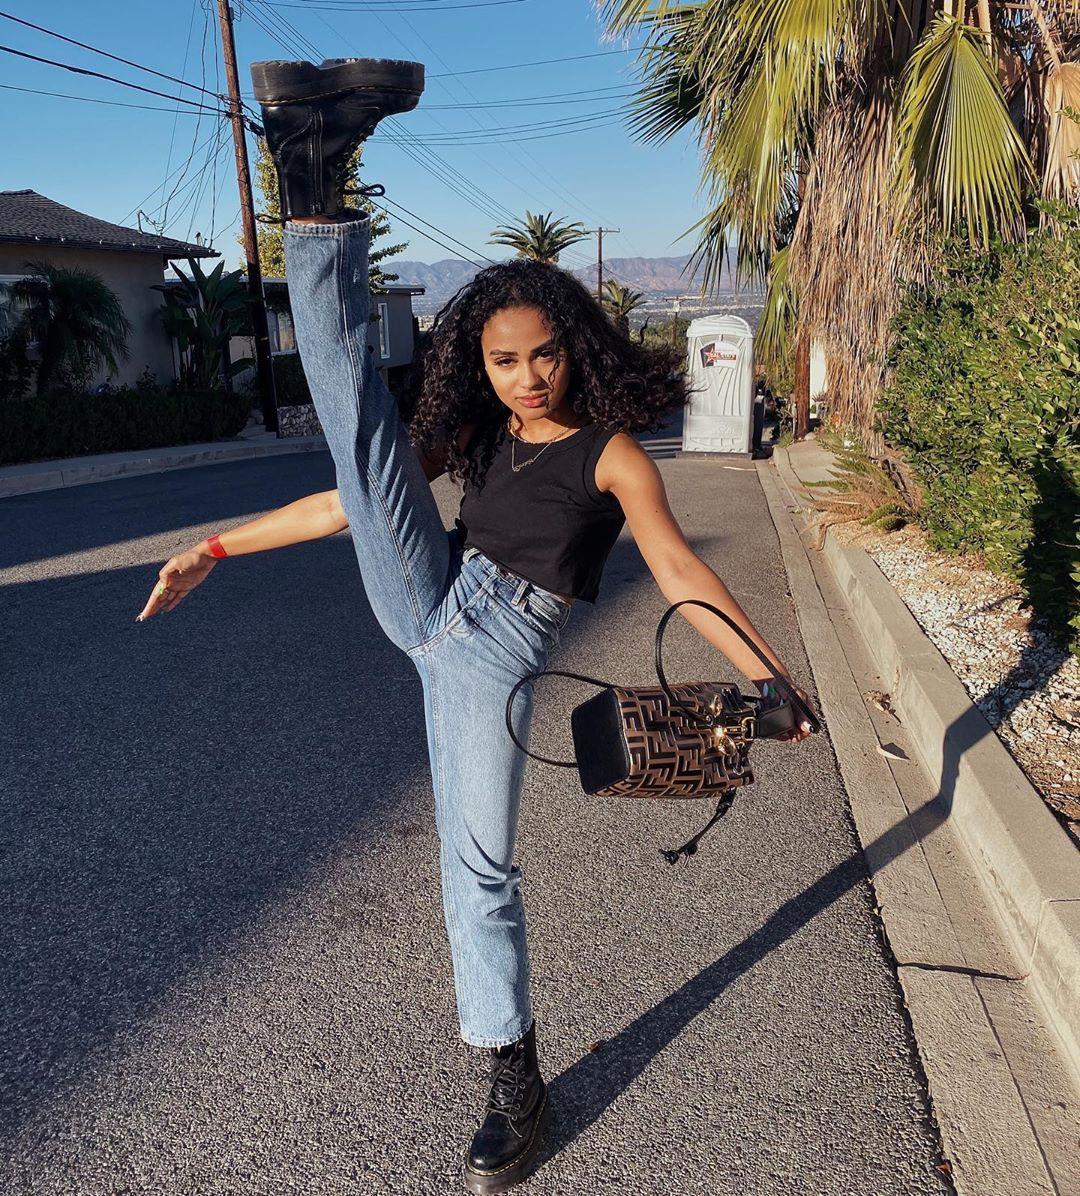 Daniella Perkins denim, jeans style outfit, instagram photoshoot